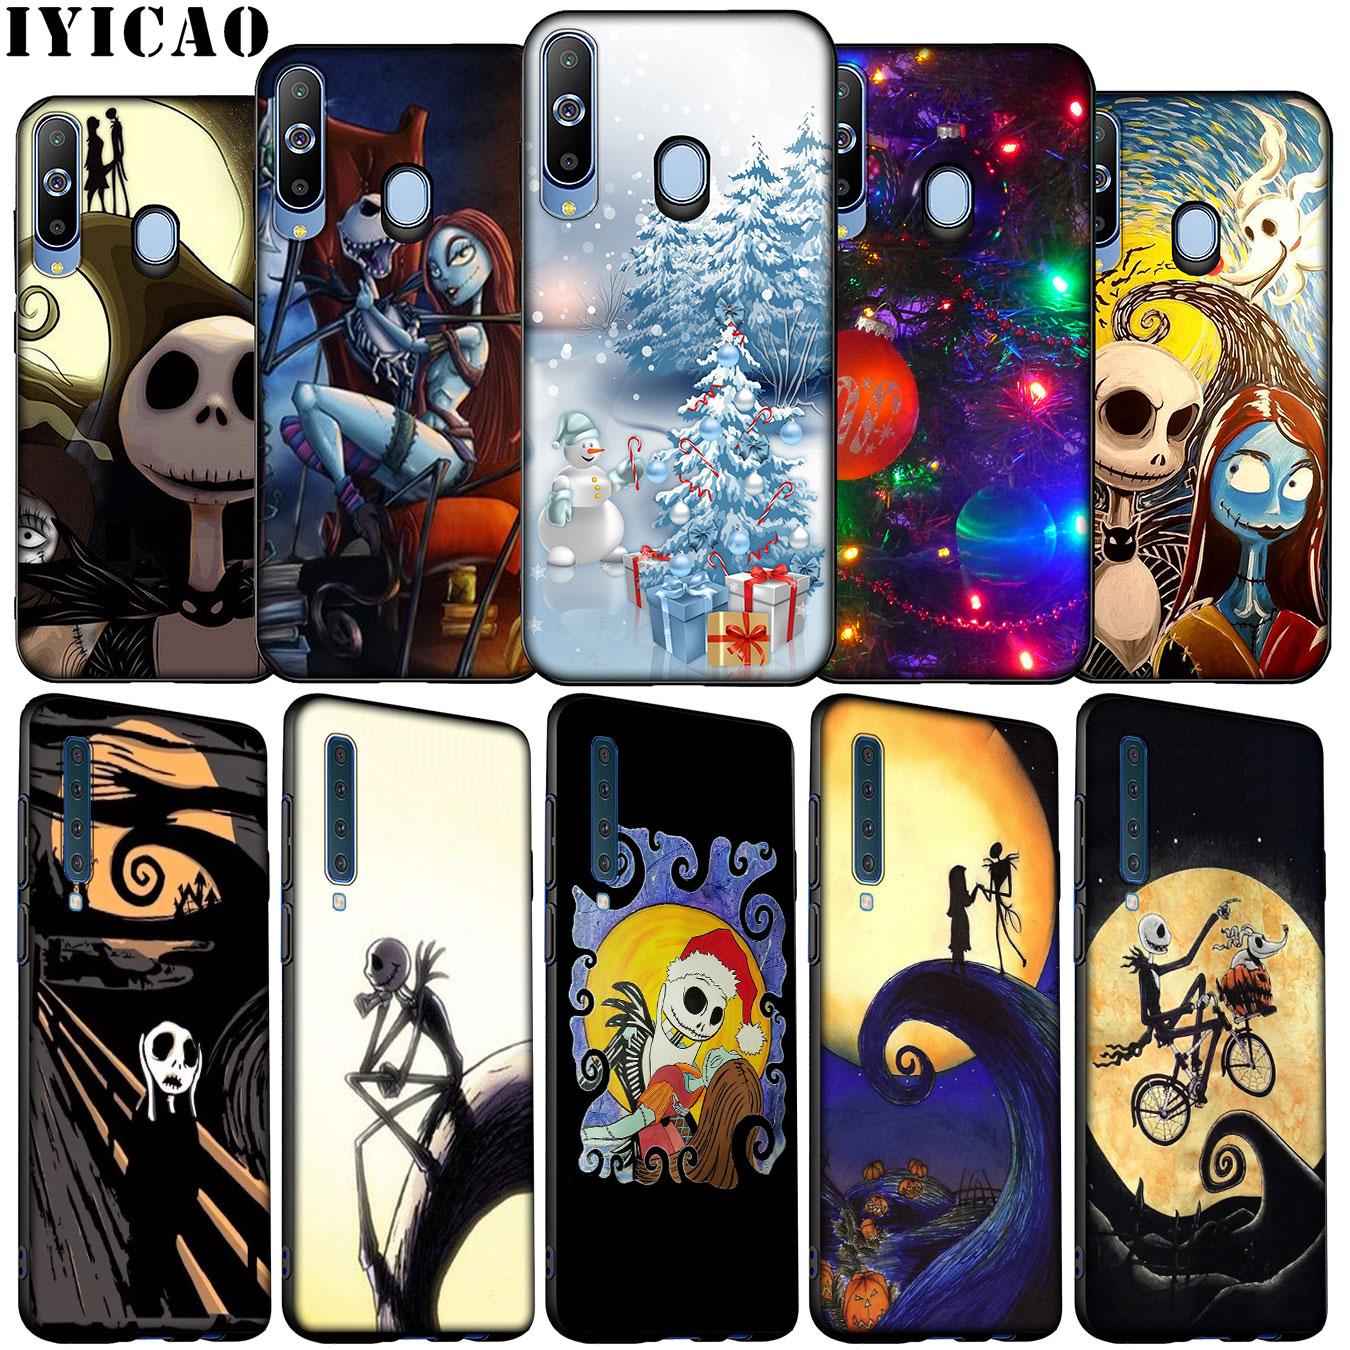 Funda de silicona blanda para Samsung Galaxy A70, A50, A60, A40, A30, A20, A10, M20, M30, M40 y A20E de pesadilla, de jack de Halloween